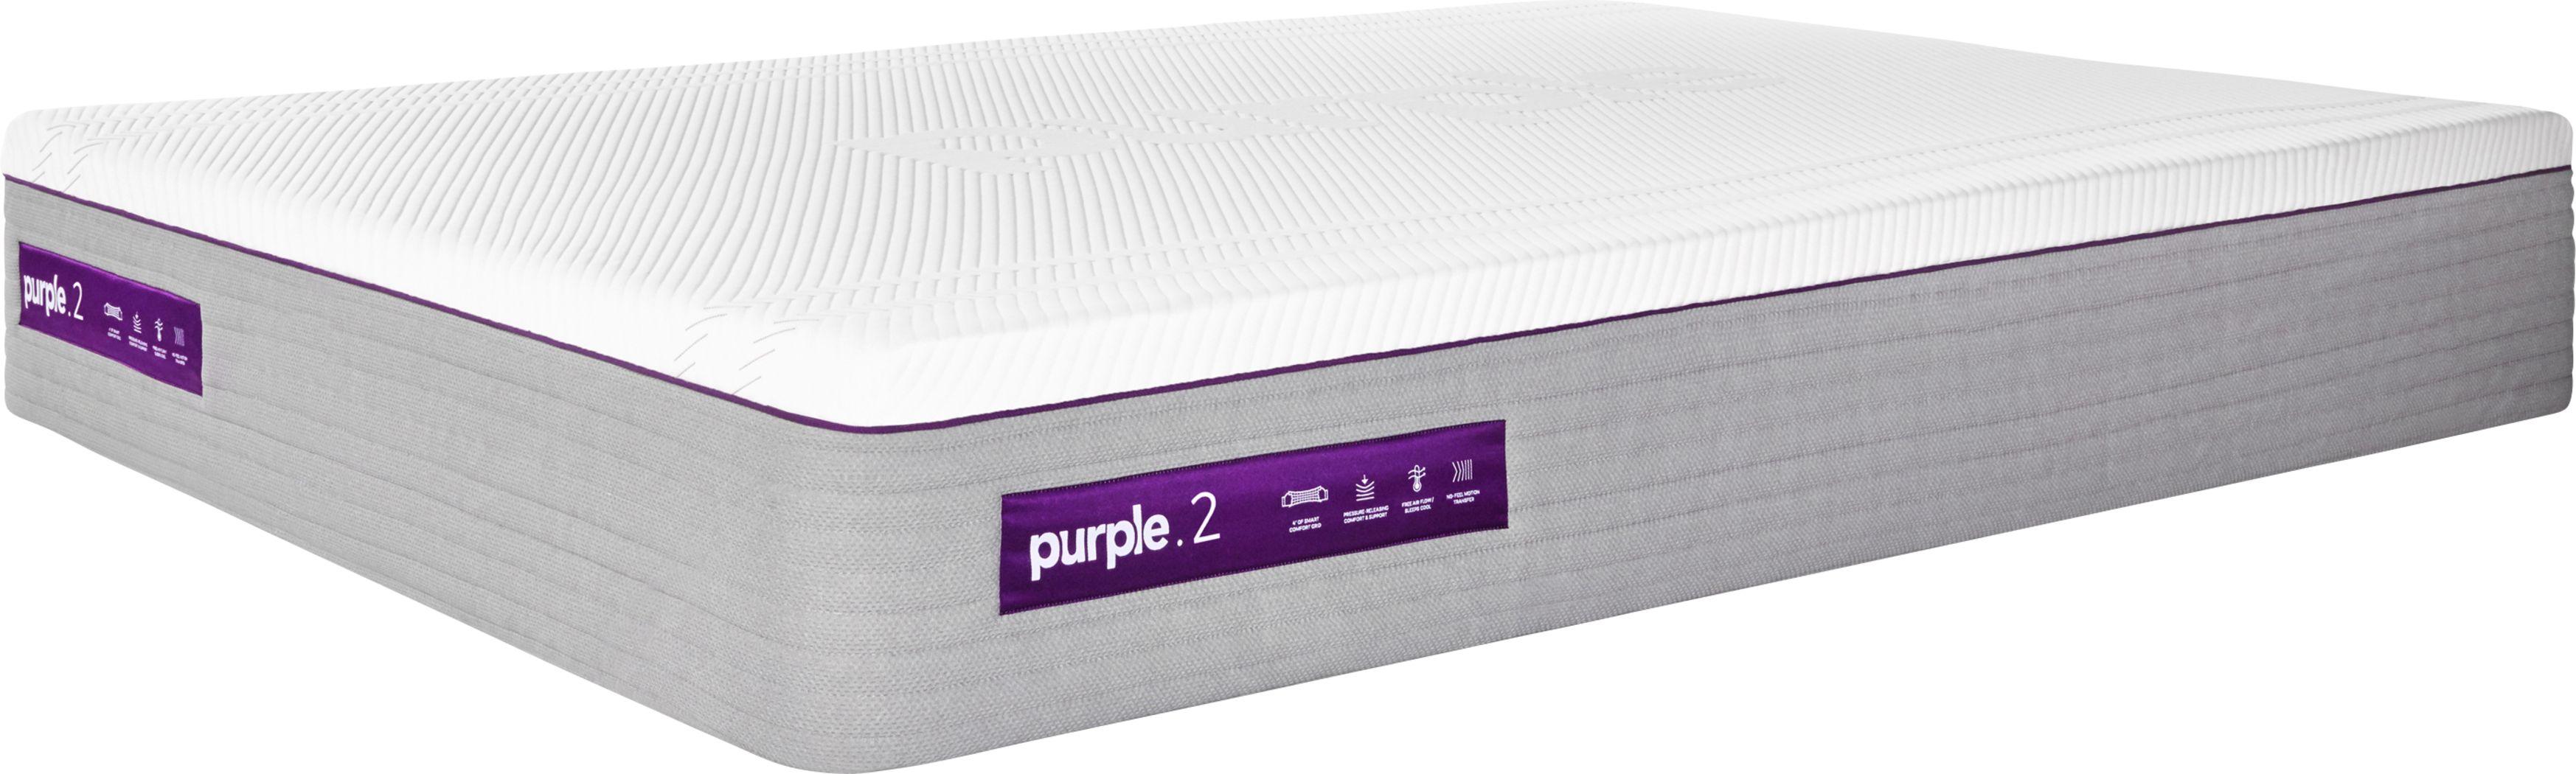 Purple Hybrid 2 California King Mattress